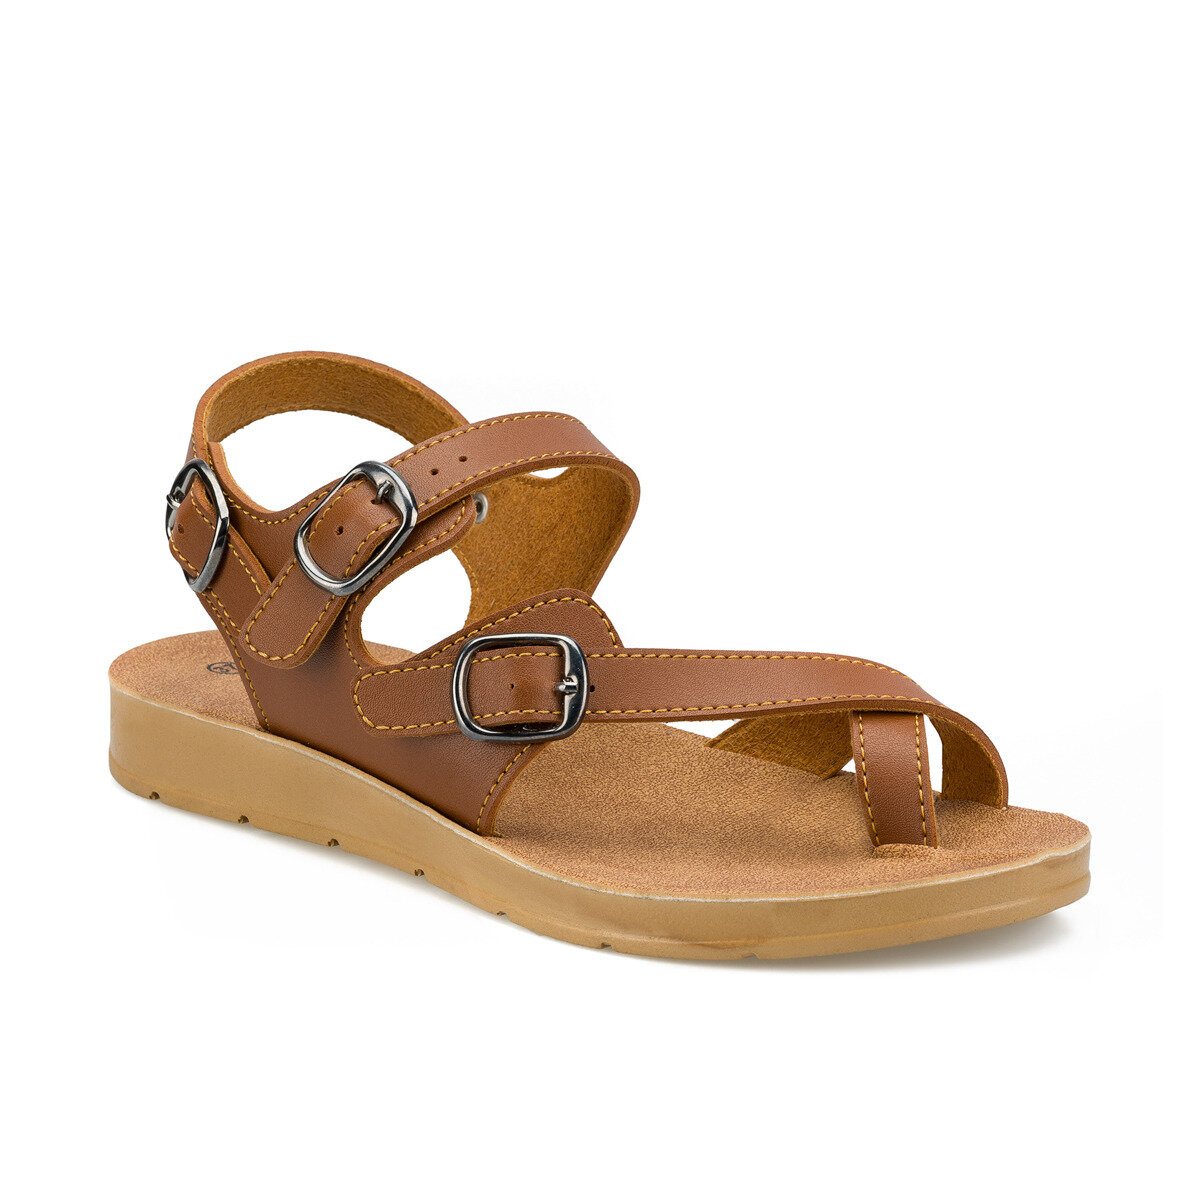 FLO 91. 158657.Z Tan Women 'S Sandals Polaris